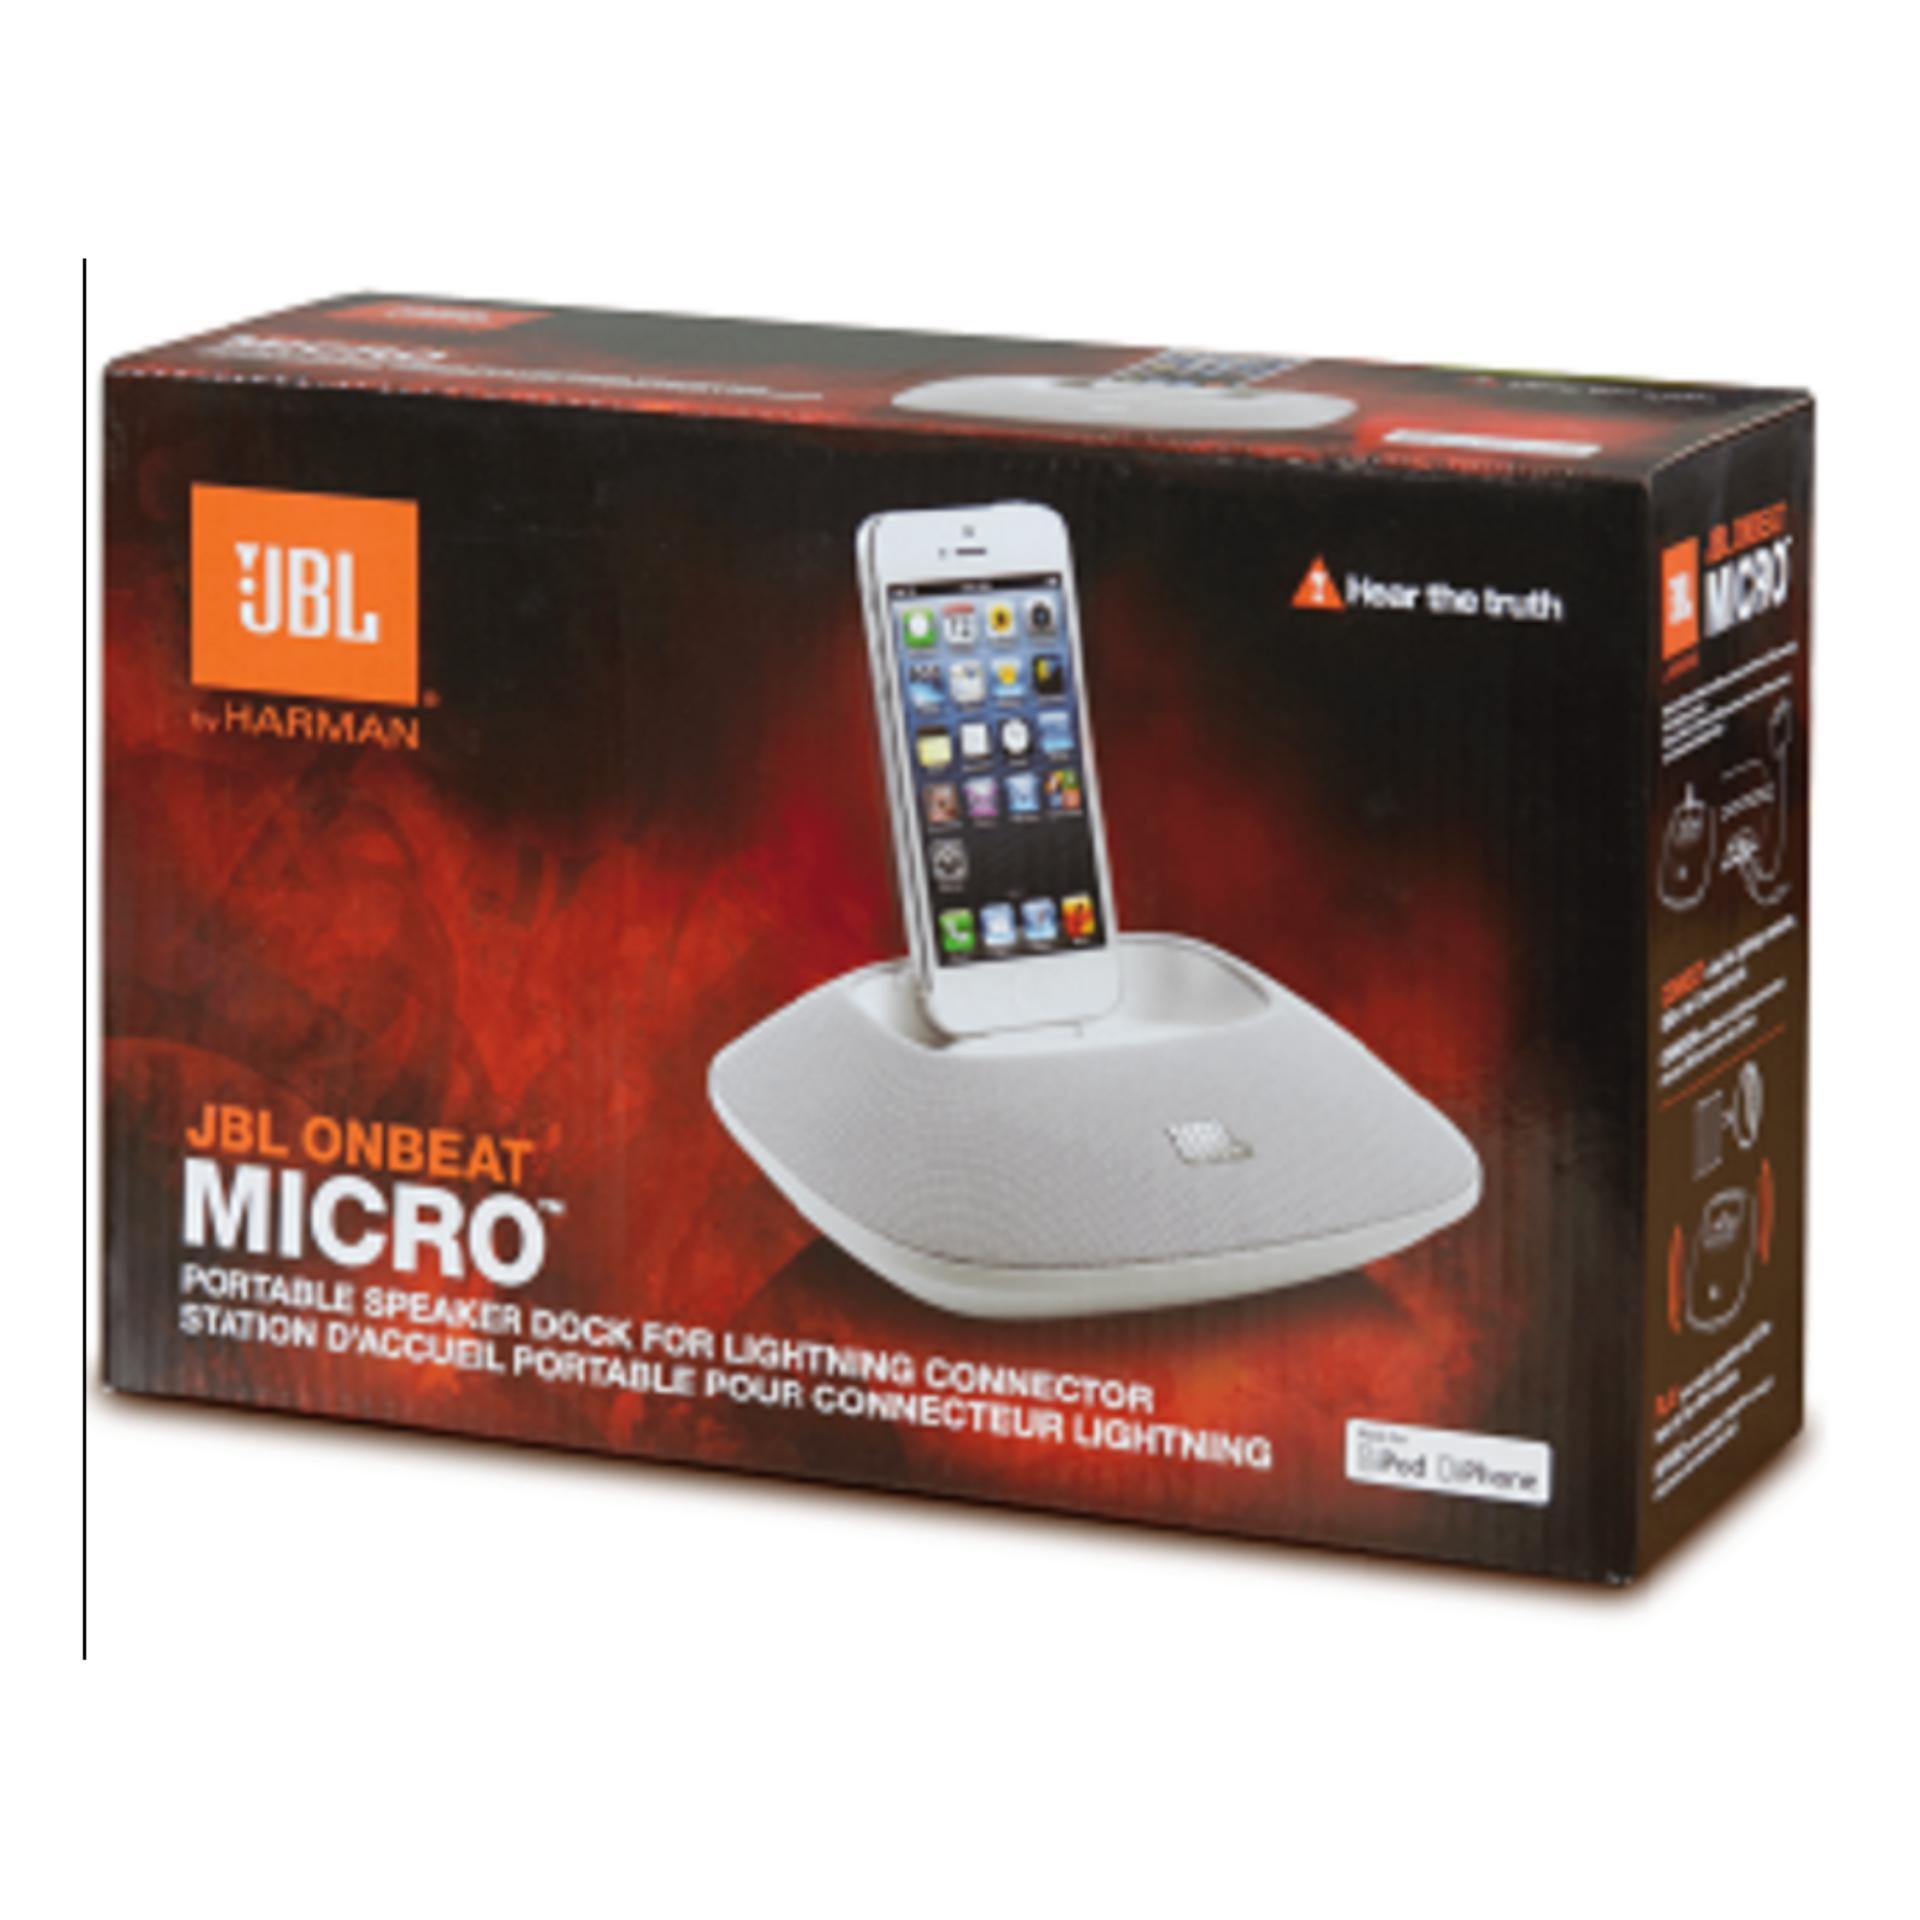 JBL OnBeat Micro Speaker Dock with Lightning Connector..